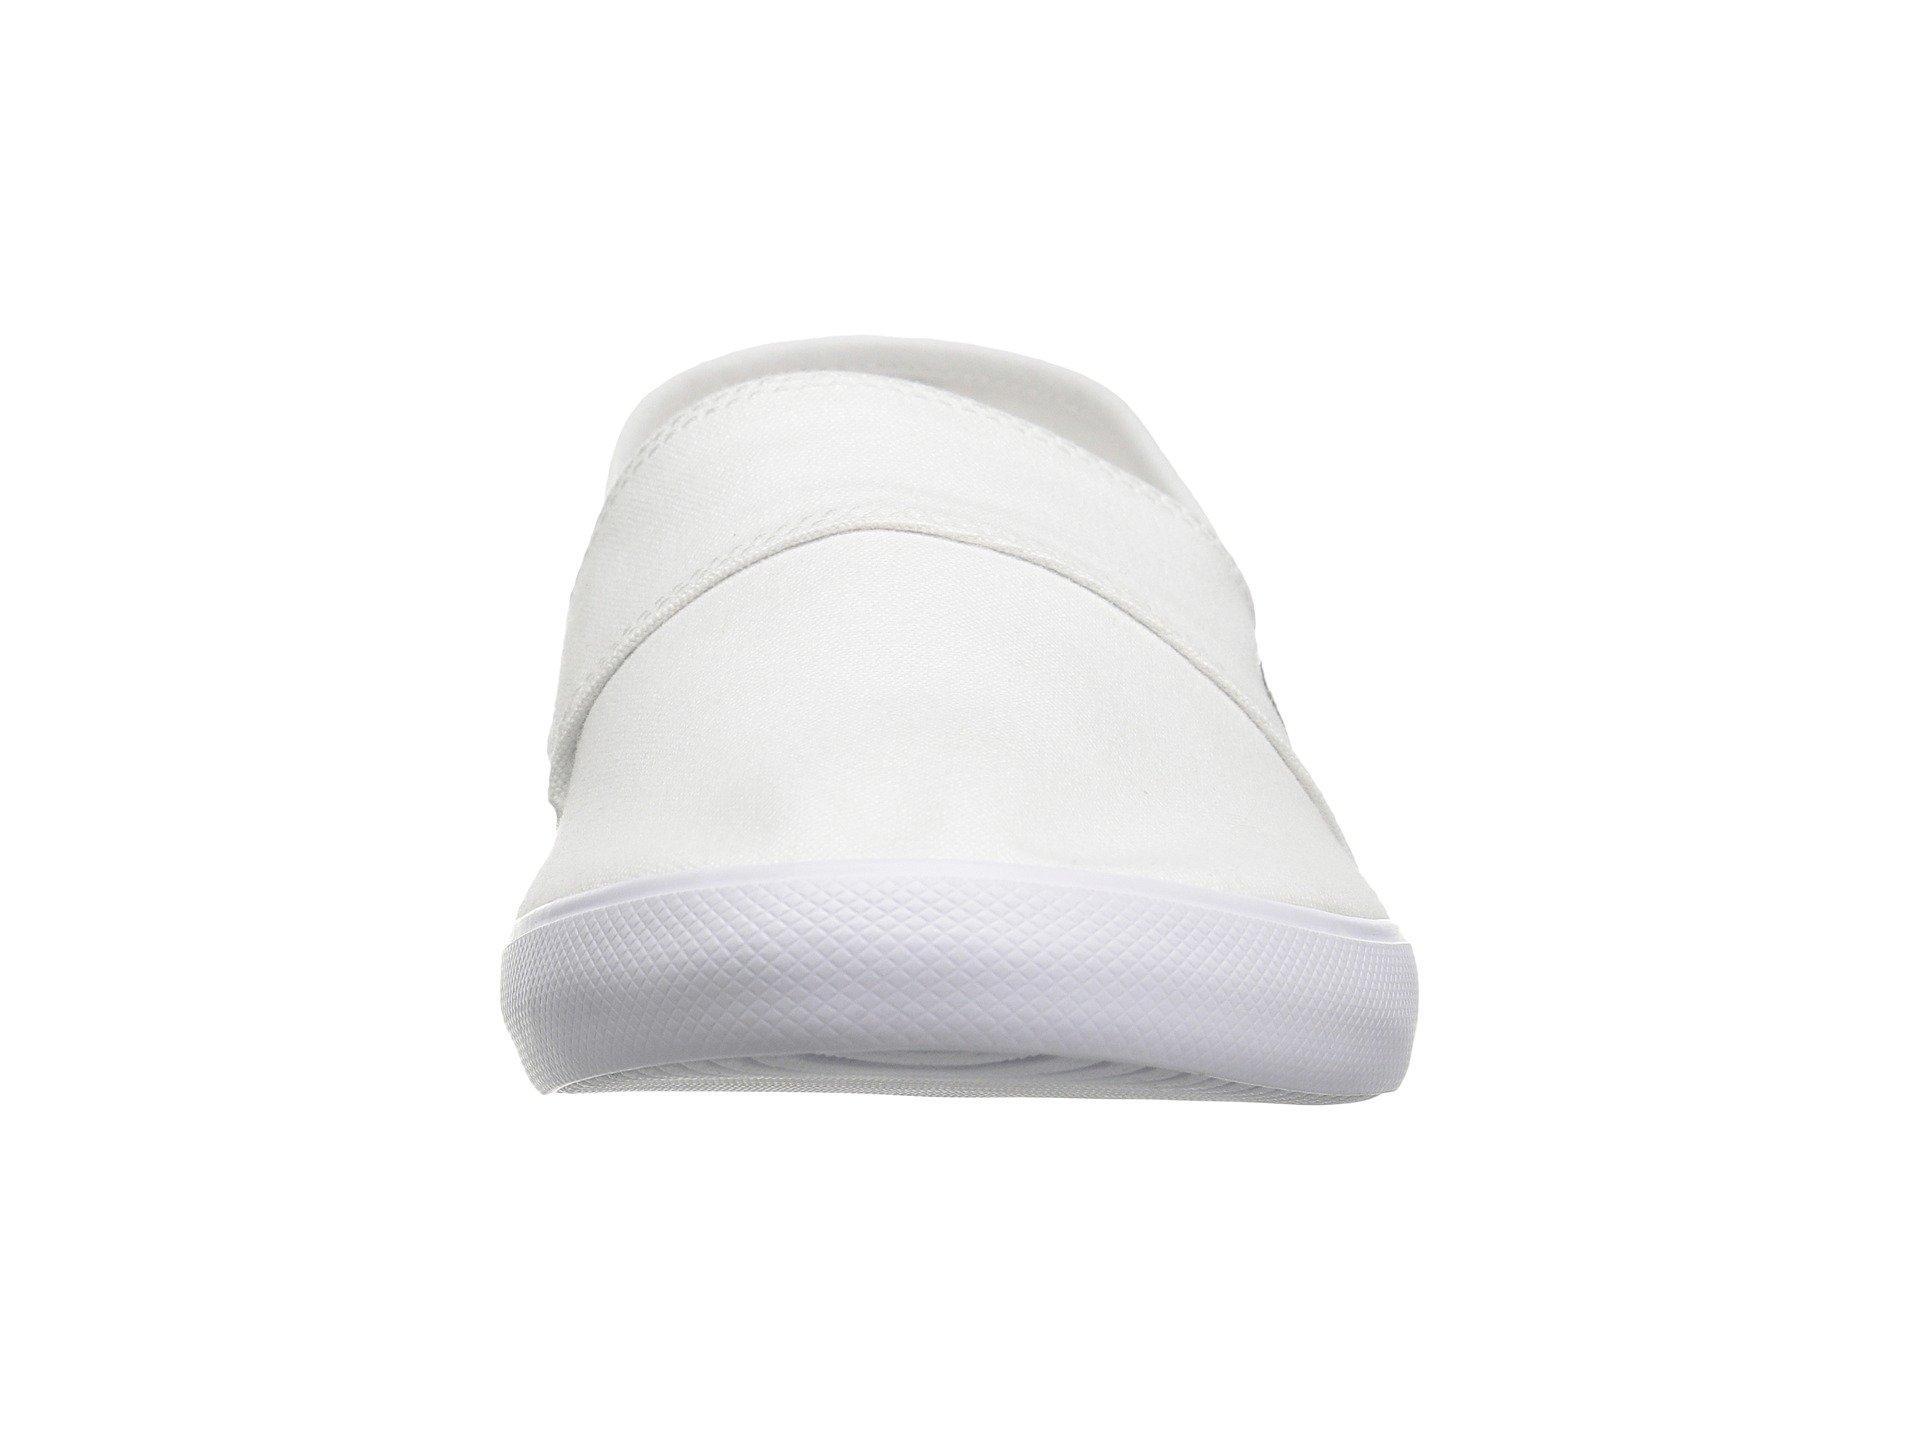 Lacoste Bl 2 Lacoste White Marice Marice F48Zx5qw